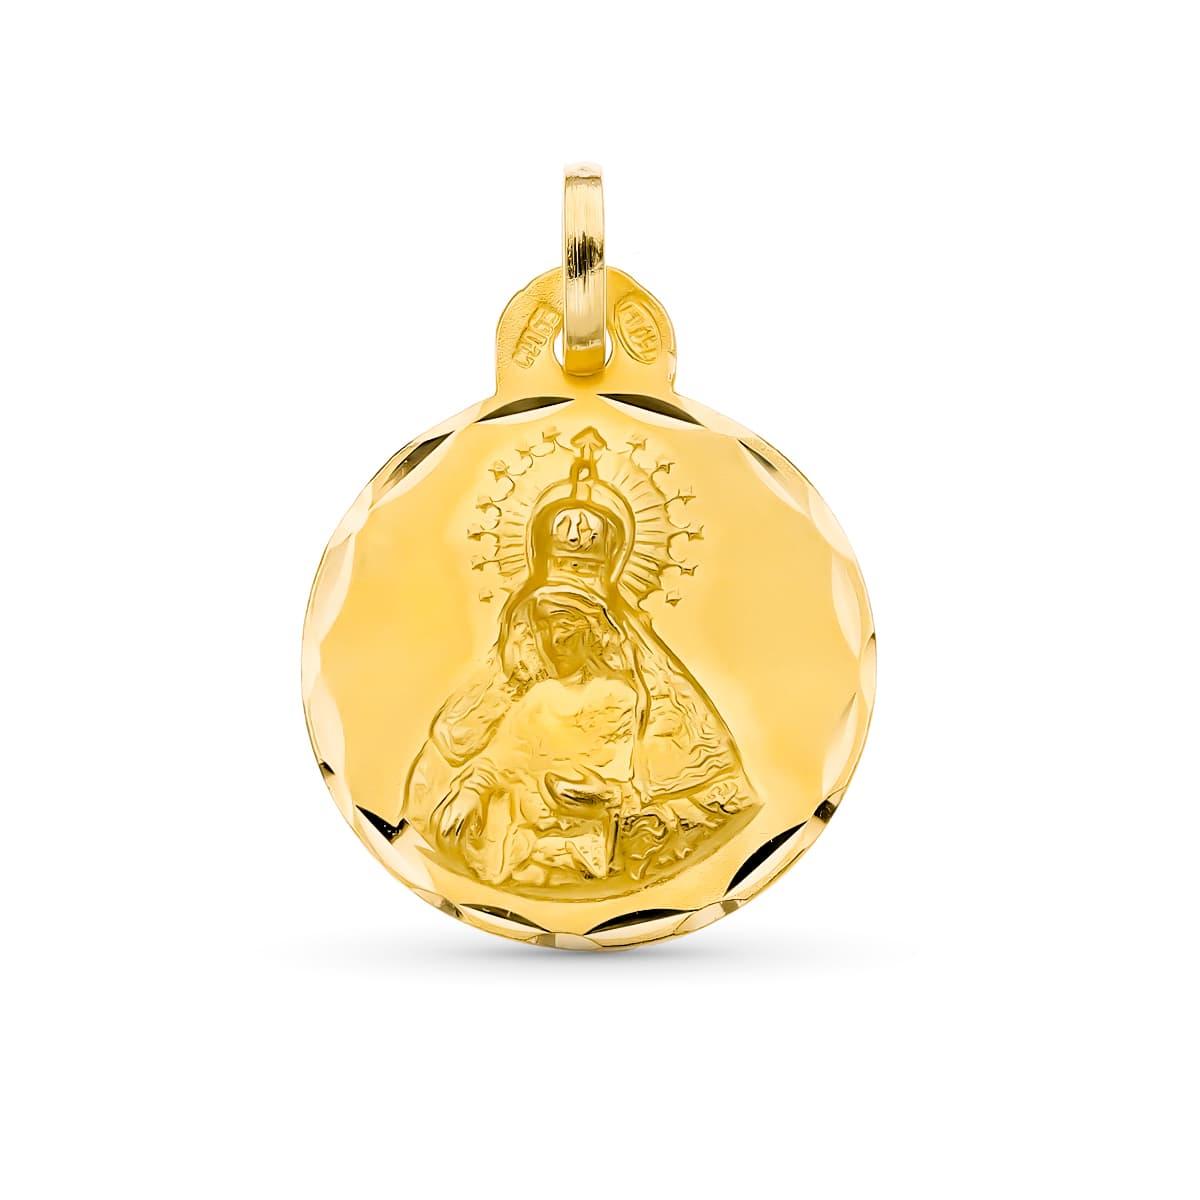 Medalla Virgen del Macarena 17 Mm. 2.10 Grs